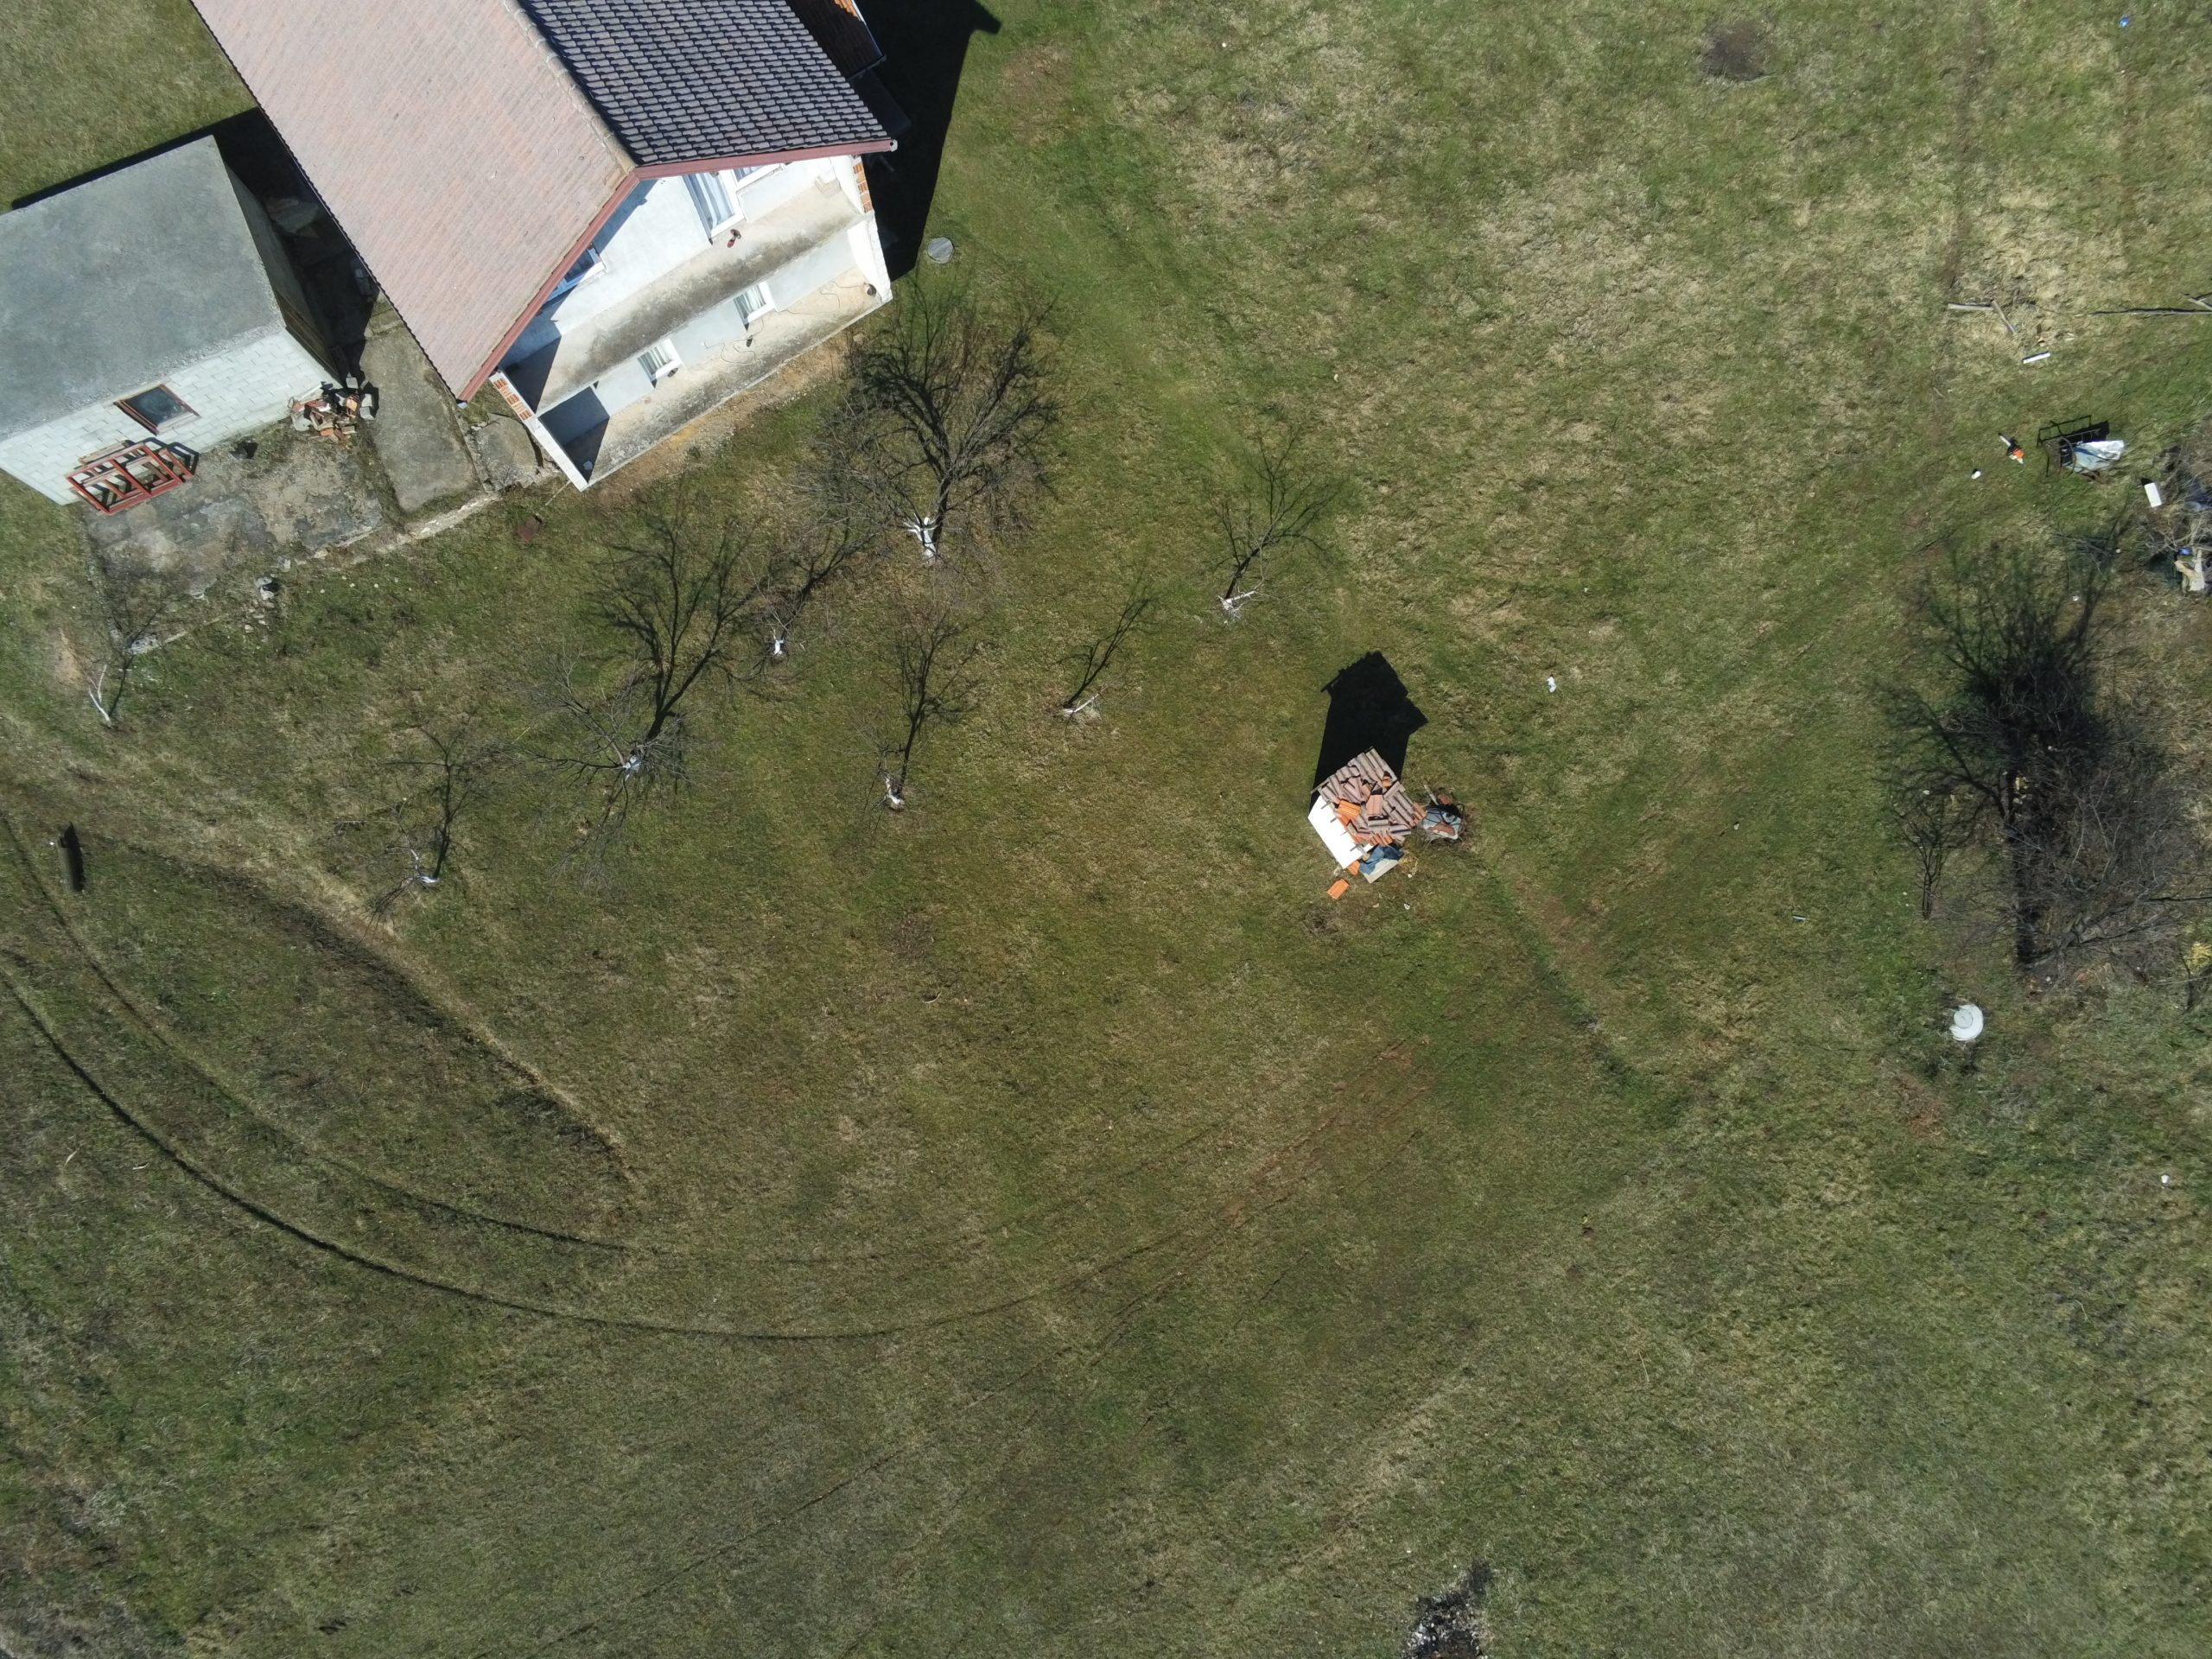 Hodzici Road 4 - Drone